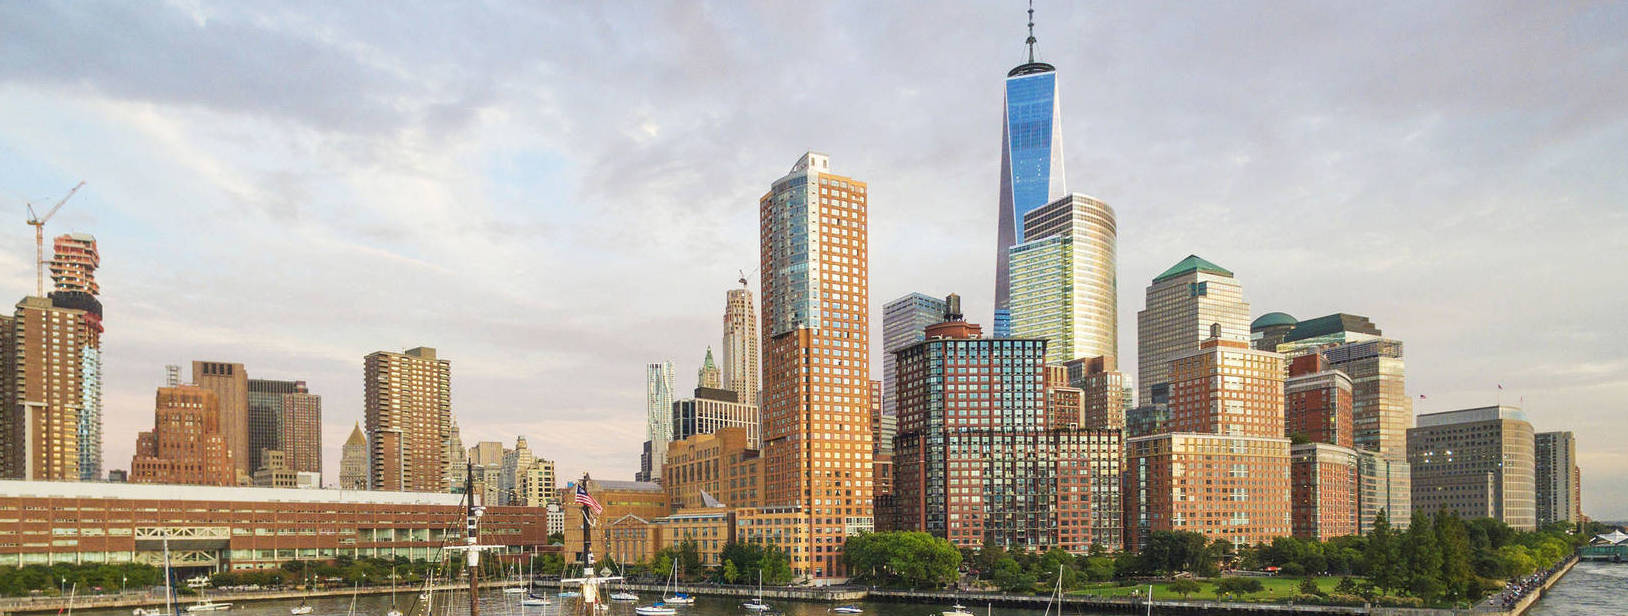 NYC Views from Pier 25 Marina | New Marinas Added | Snag-A-Slip